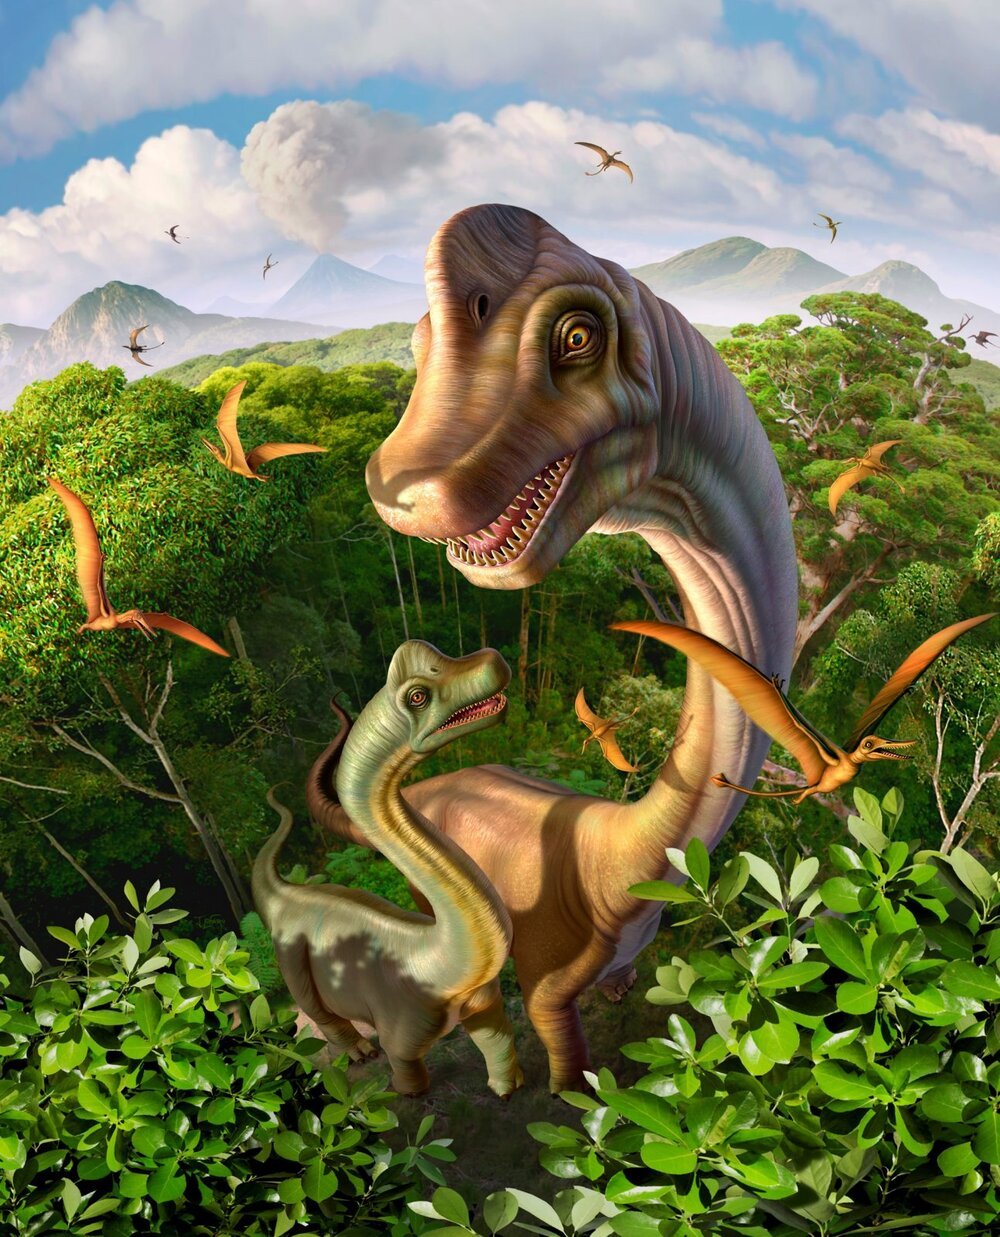 Brachiosaurus Dinosaurs by David Textiles